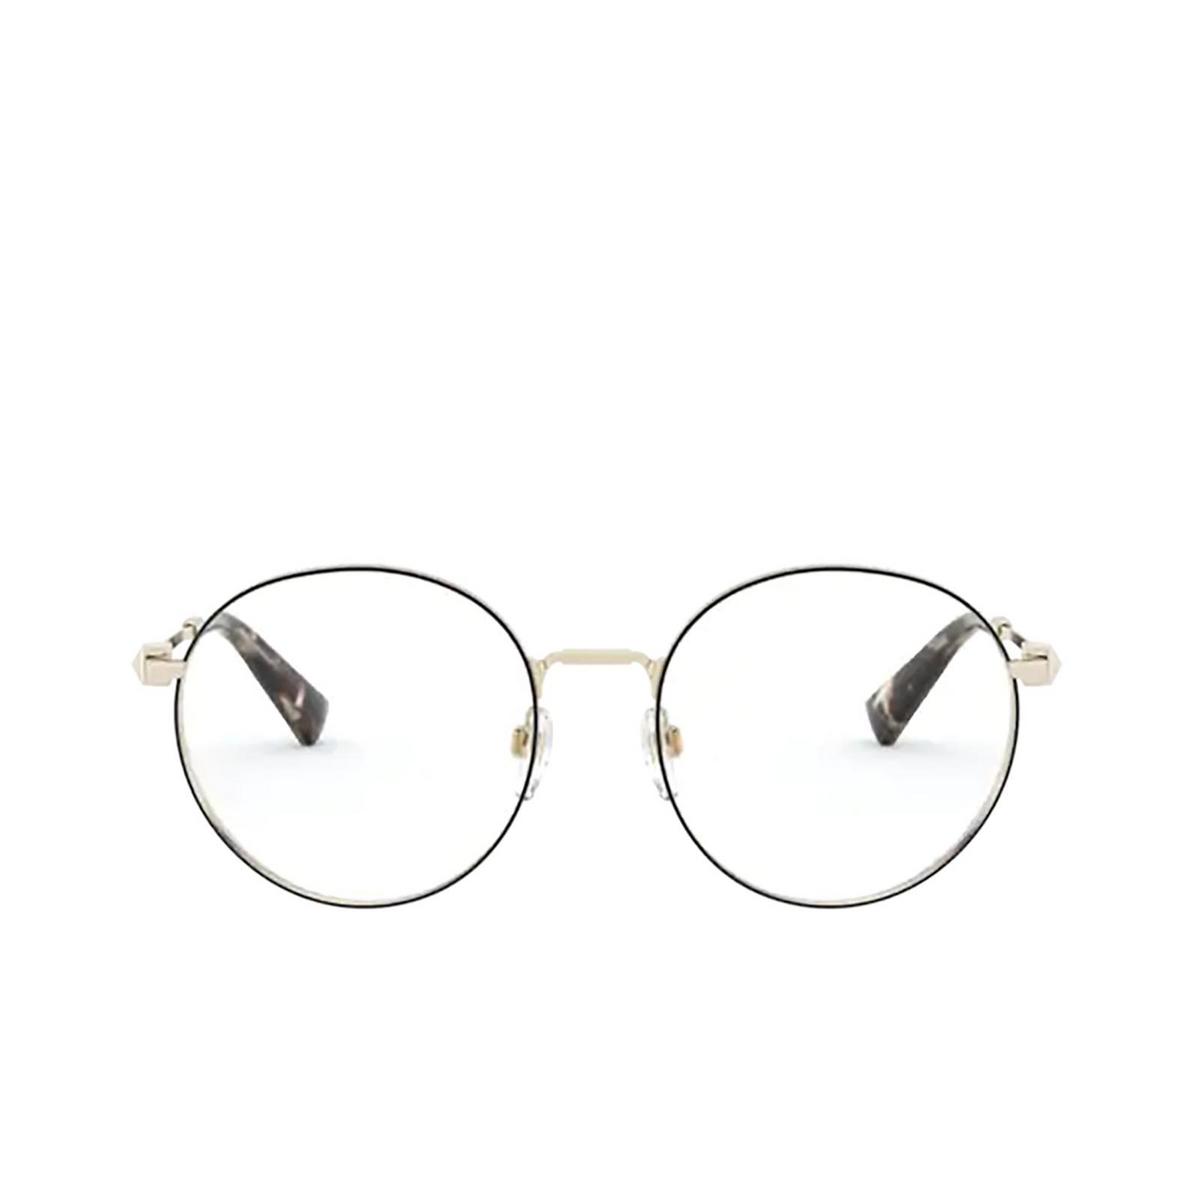 Valentino® Round Eyeglasses: VA1020 color Pale Gold / Black 3003 - front view.